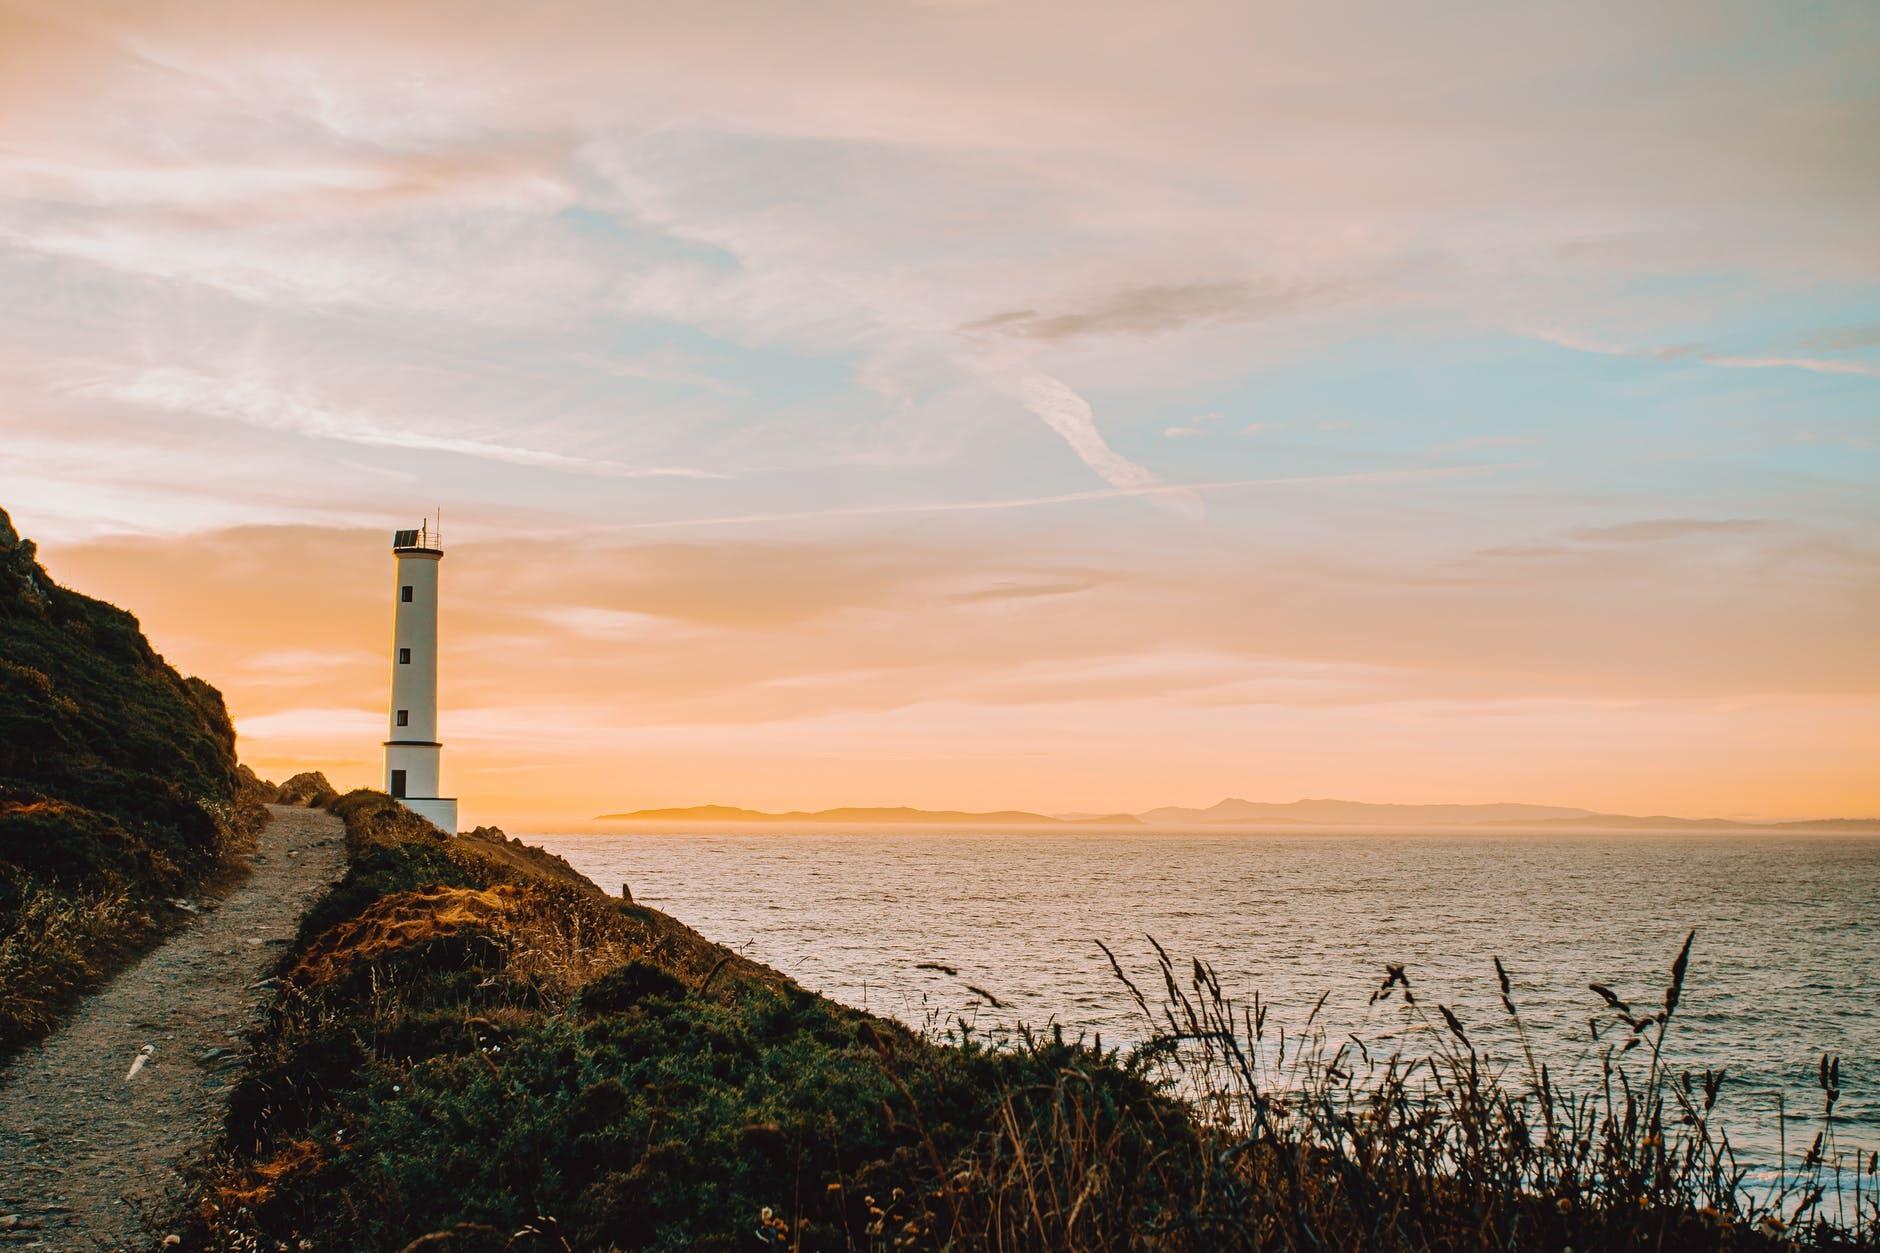 lighthouse on mountain near ocean under sky at sundown